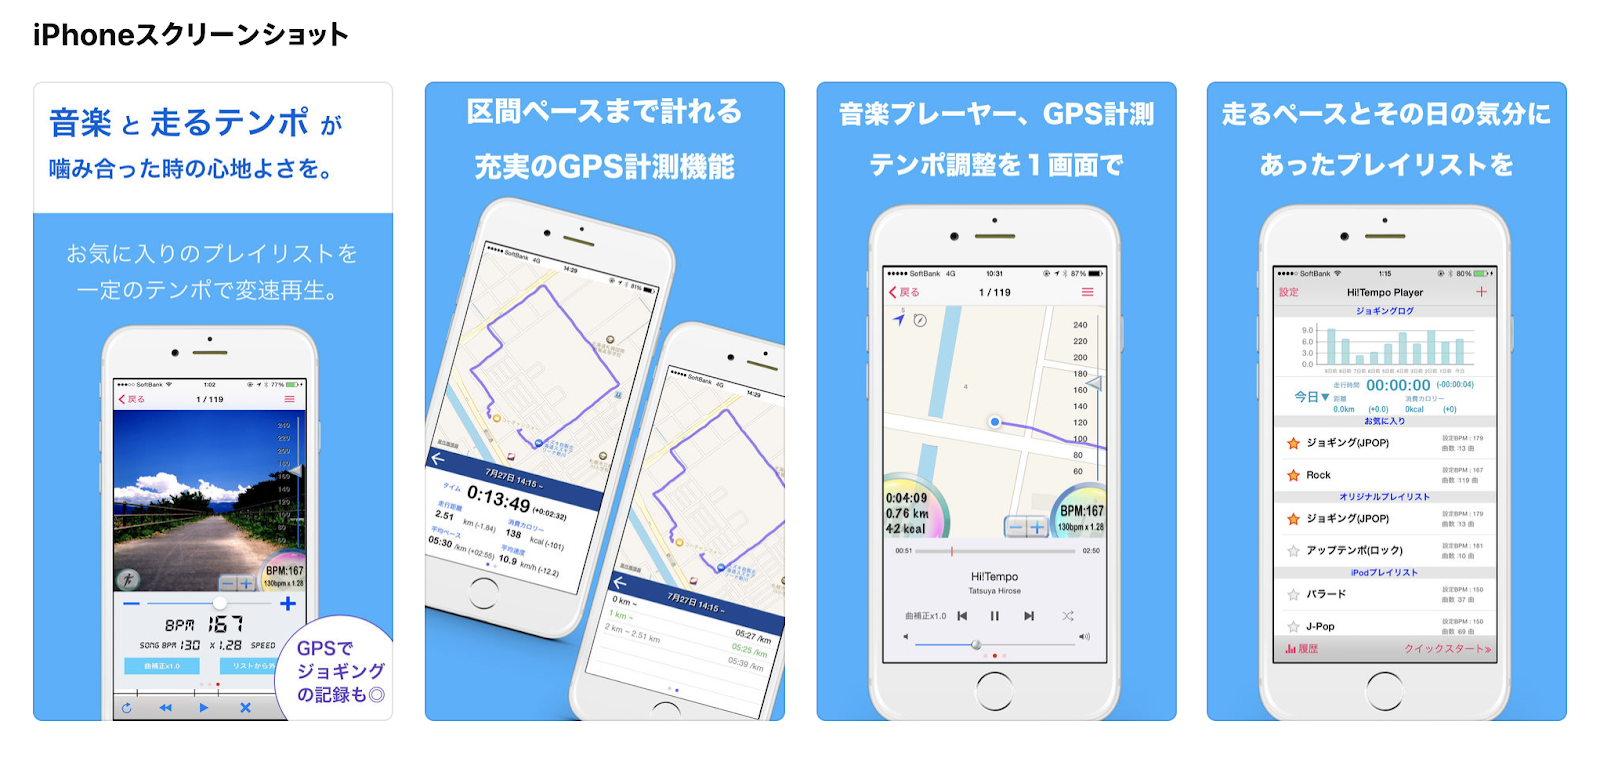 https://itunes.apple.com/jp/app/hi-tempo-player-gps対応ジョギング-ランニング用音楽プレーヤーアプリ/id1016281460?mt=8